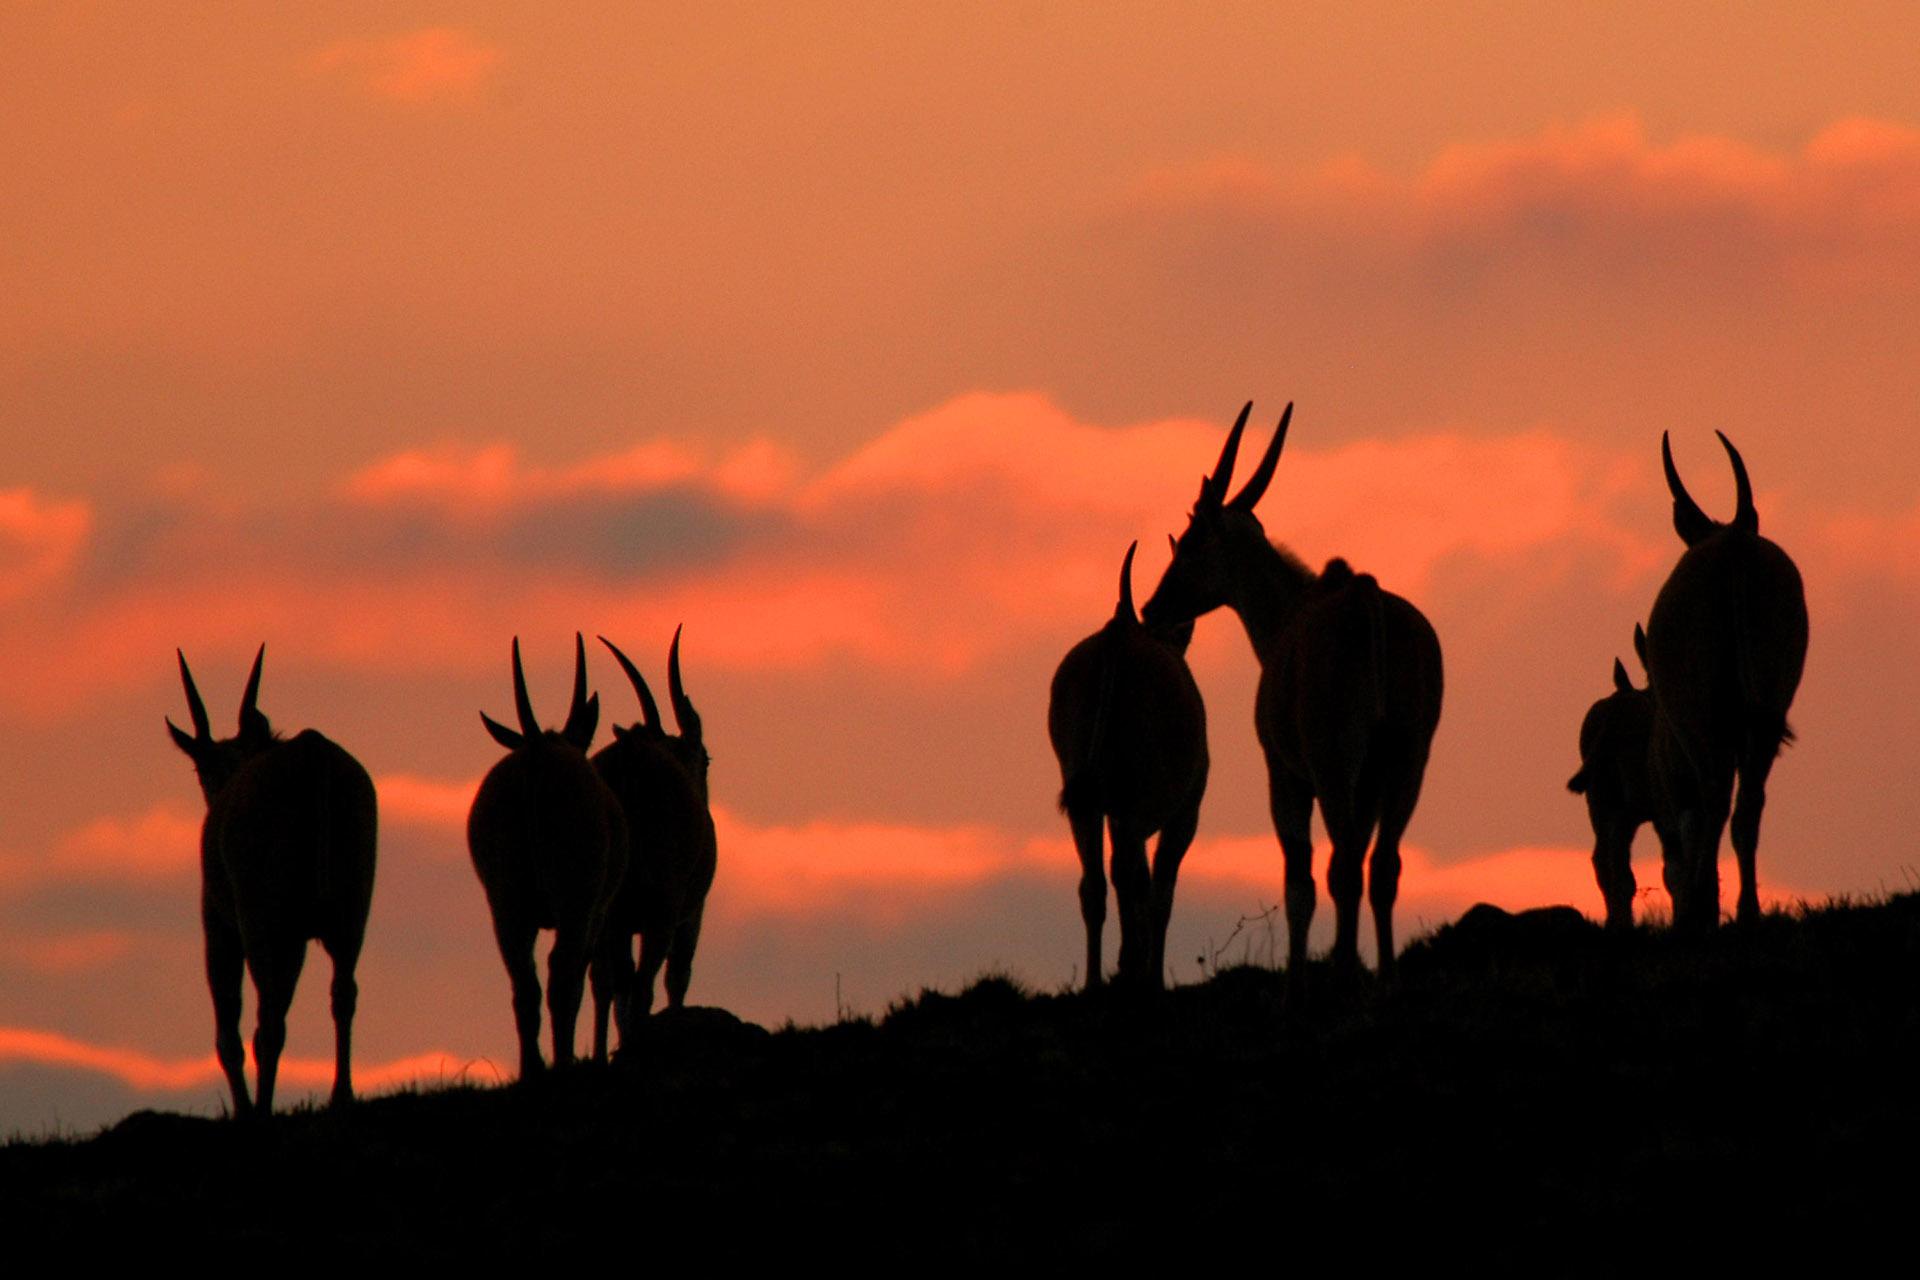 sustainable tourism malawian-style-malawi-adventures-experiences-specialist-tour-operator-chelinda-lodge-wildlife